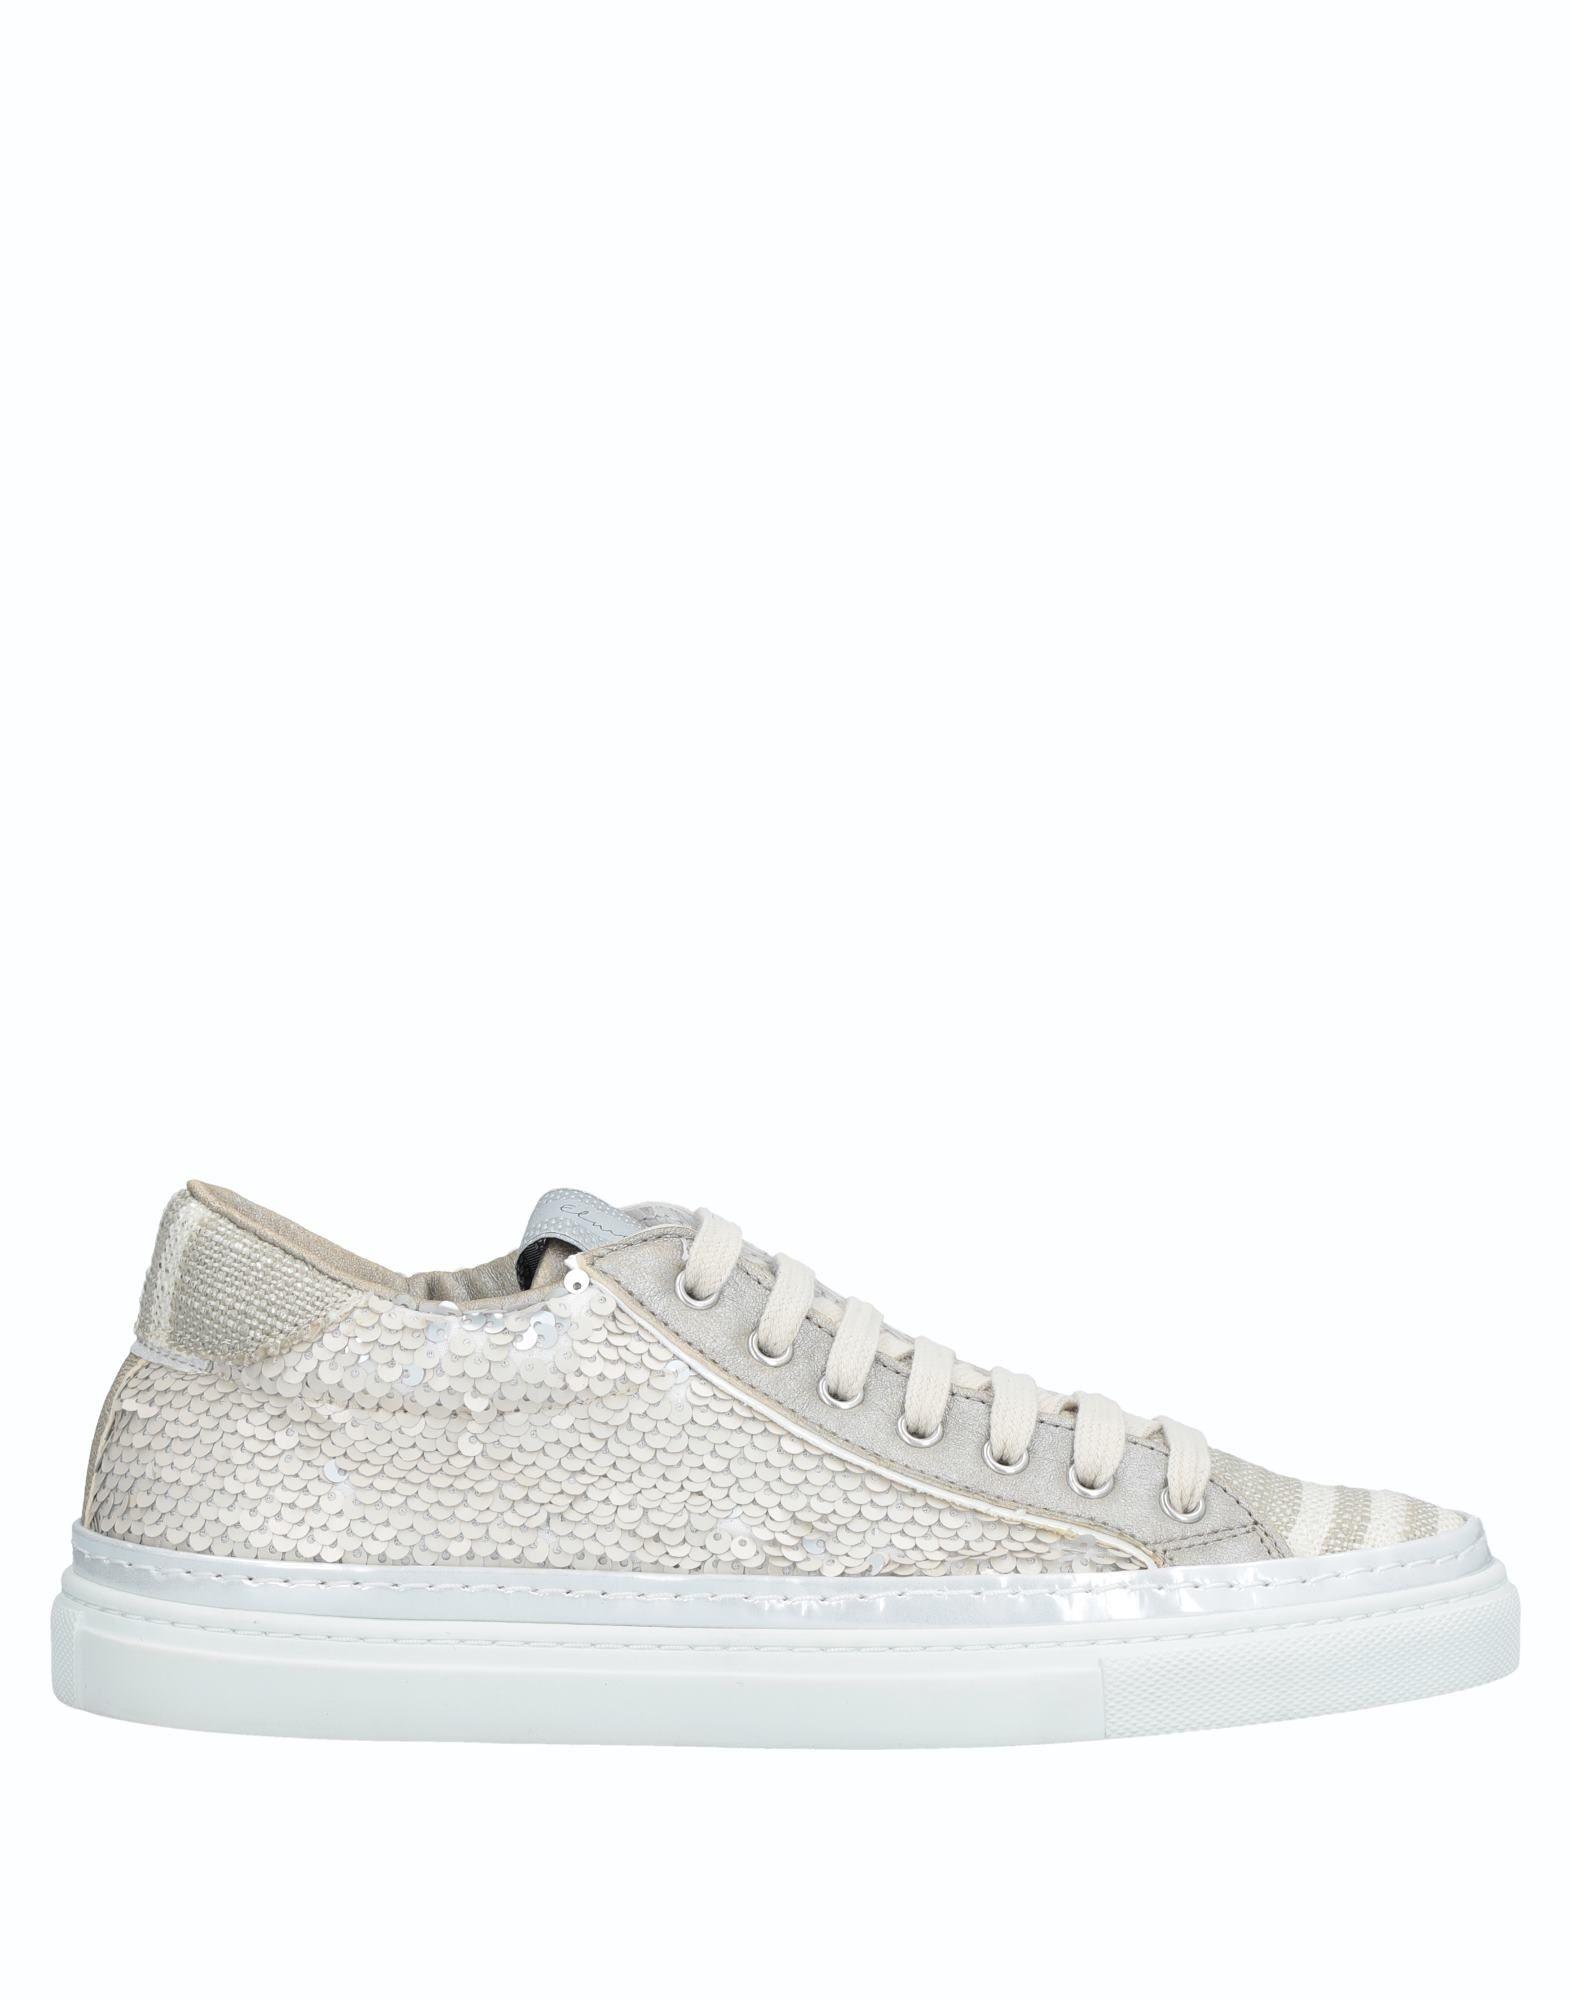 Elma Milani Sneakers Damen  11537236TK Gute Qualität beliebte Schuhe